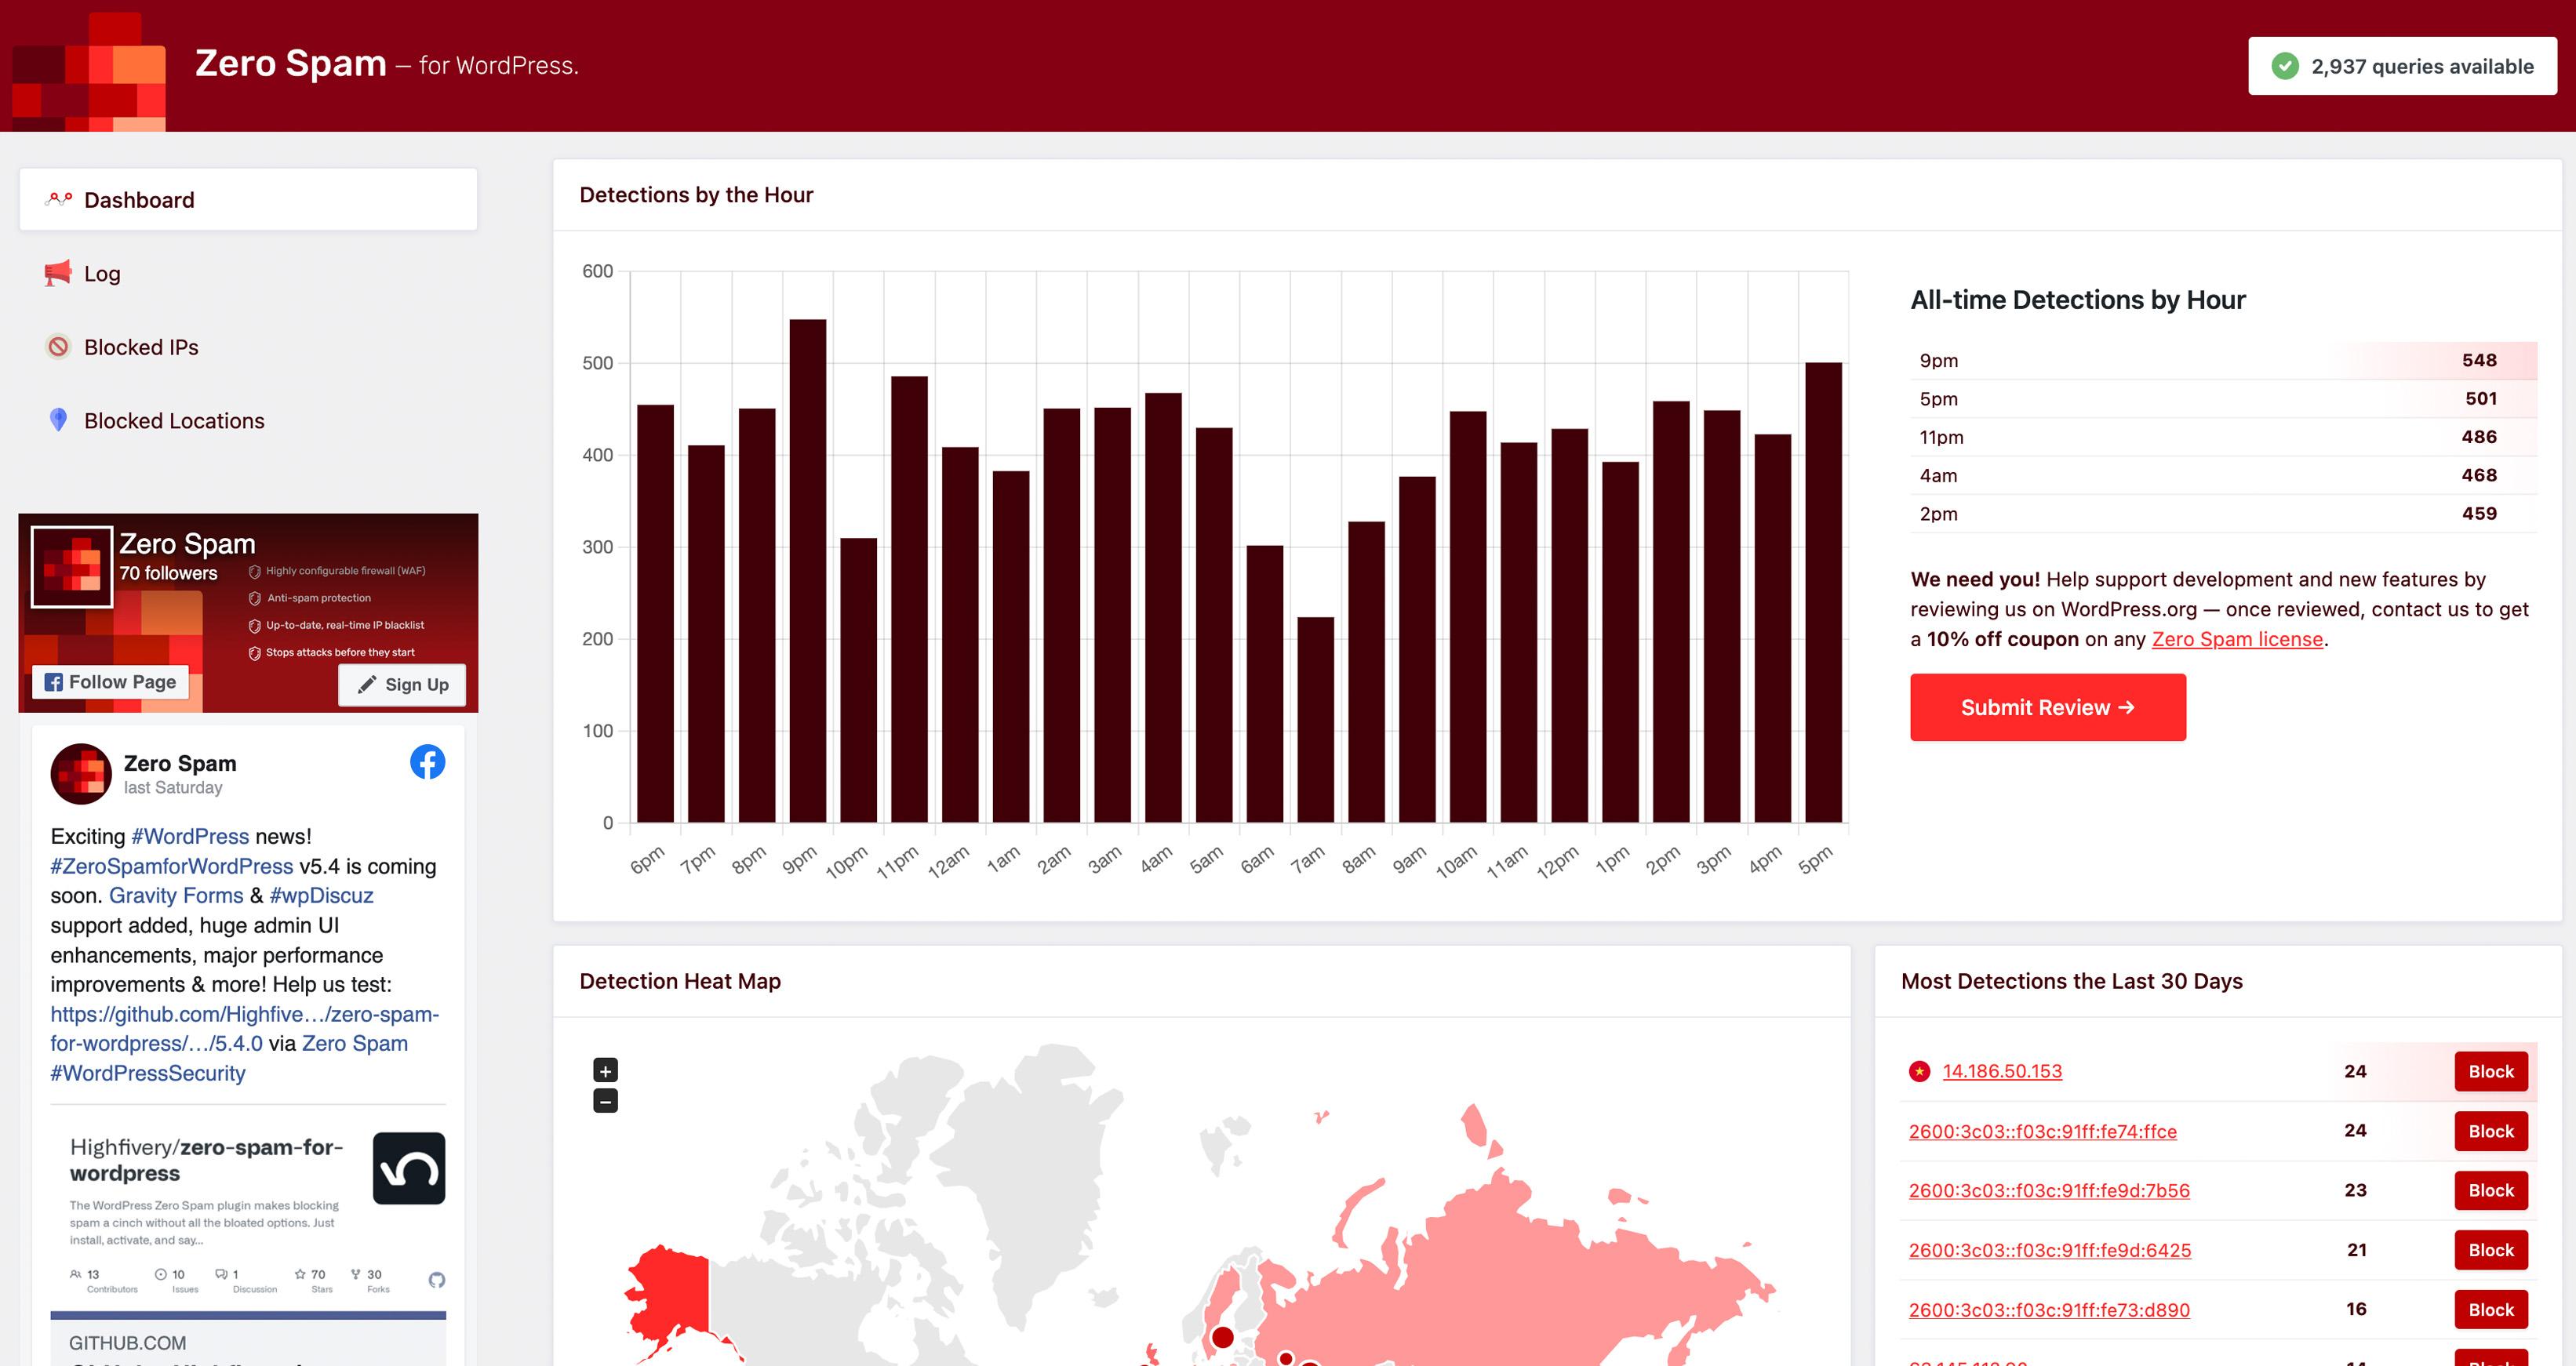 WordPress Zero Spam dashboard